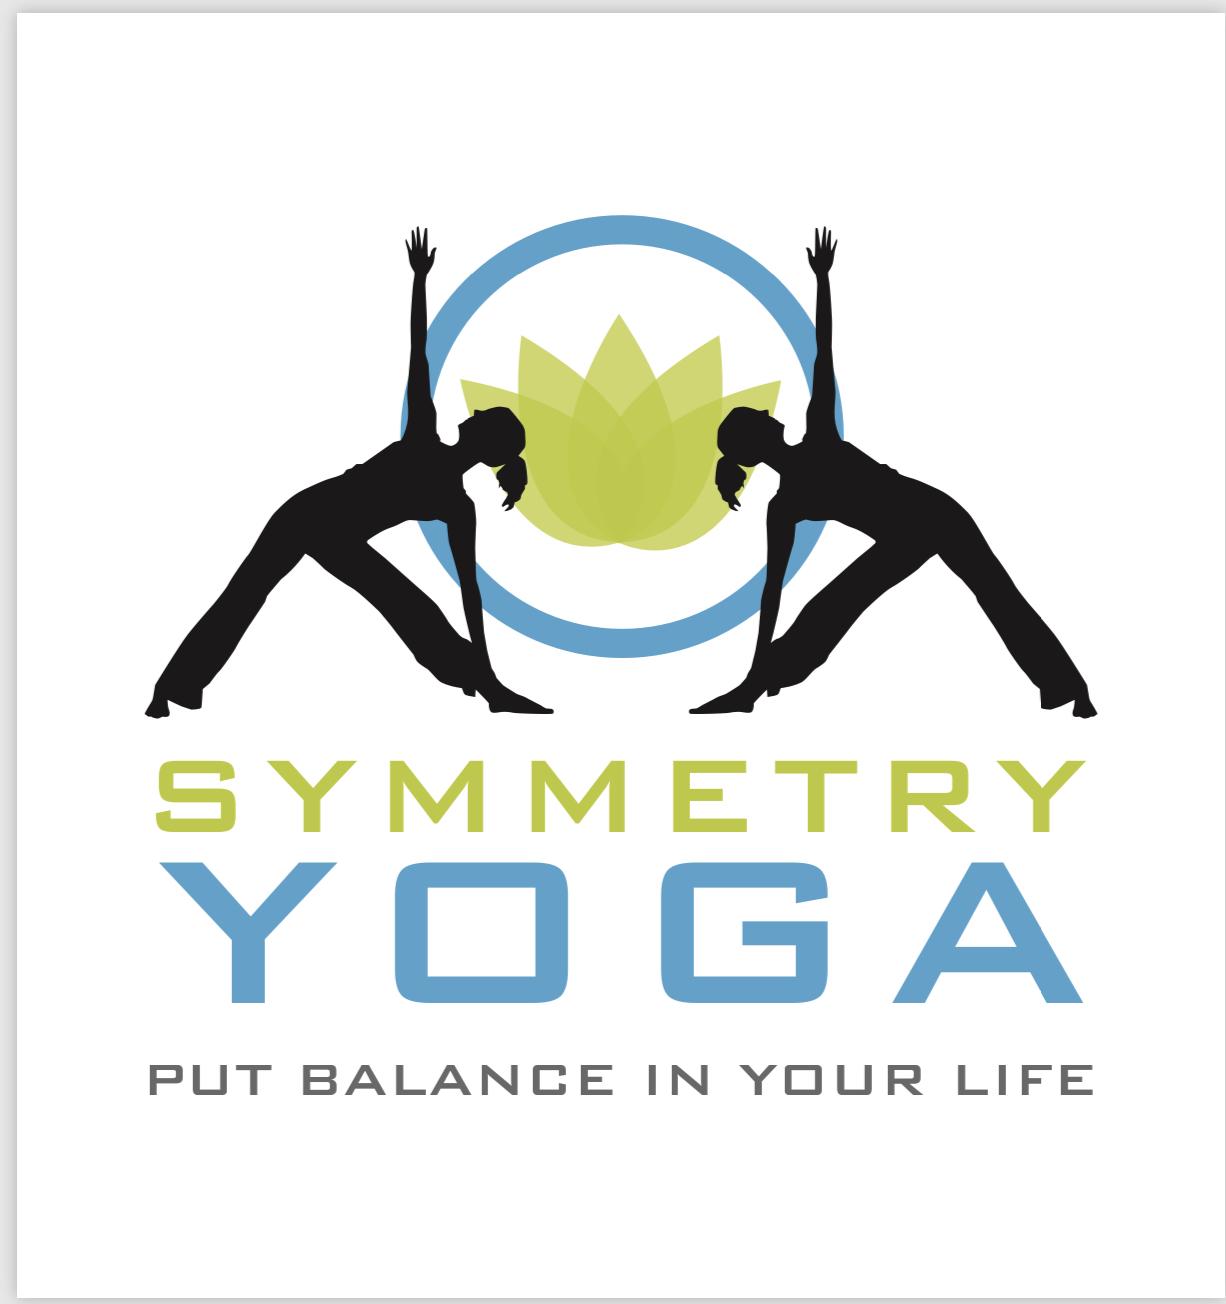 Symmetry yoga studio seacoast